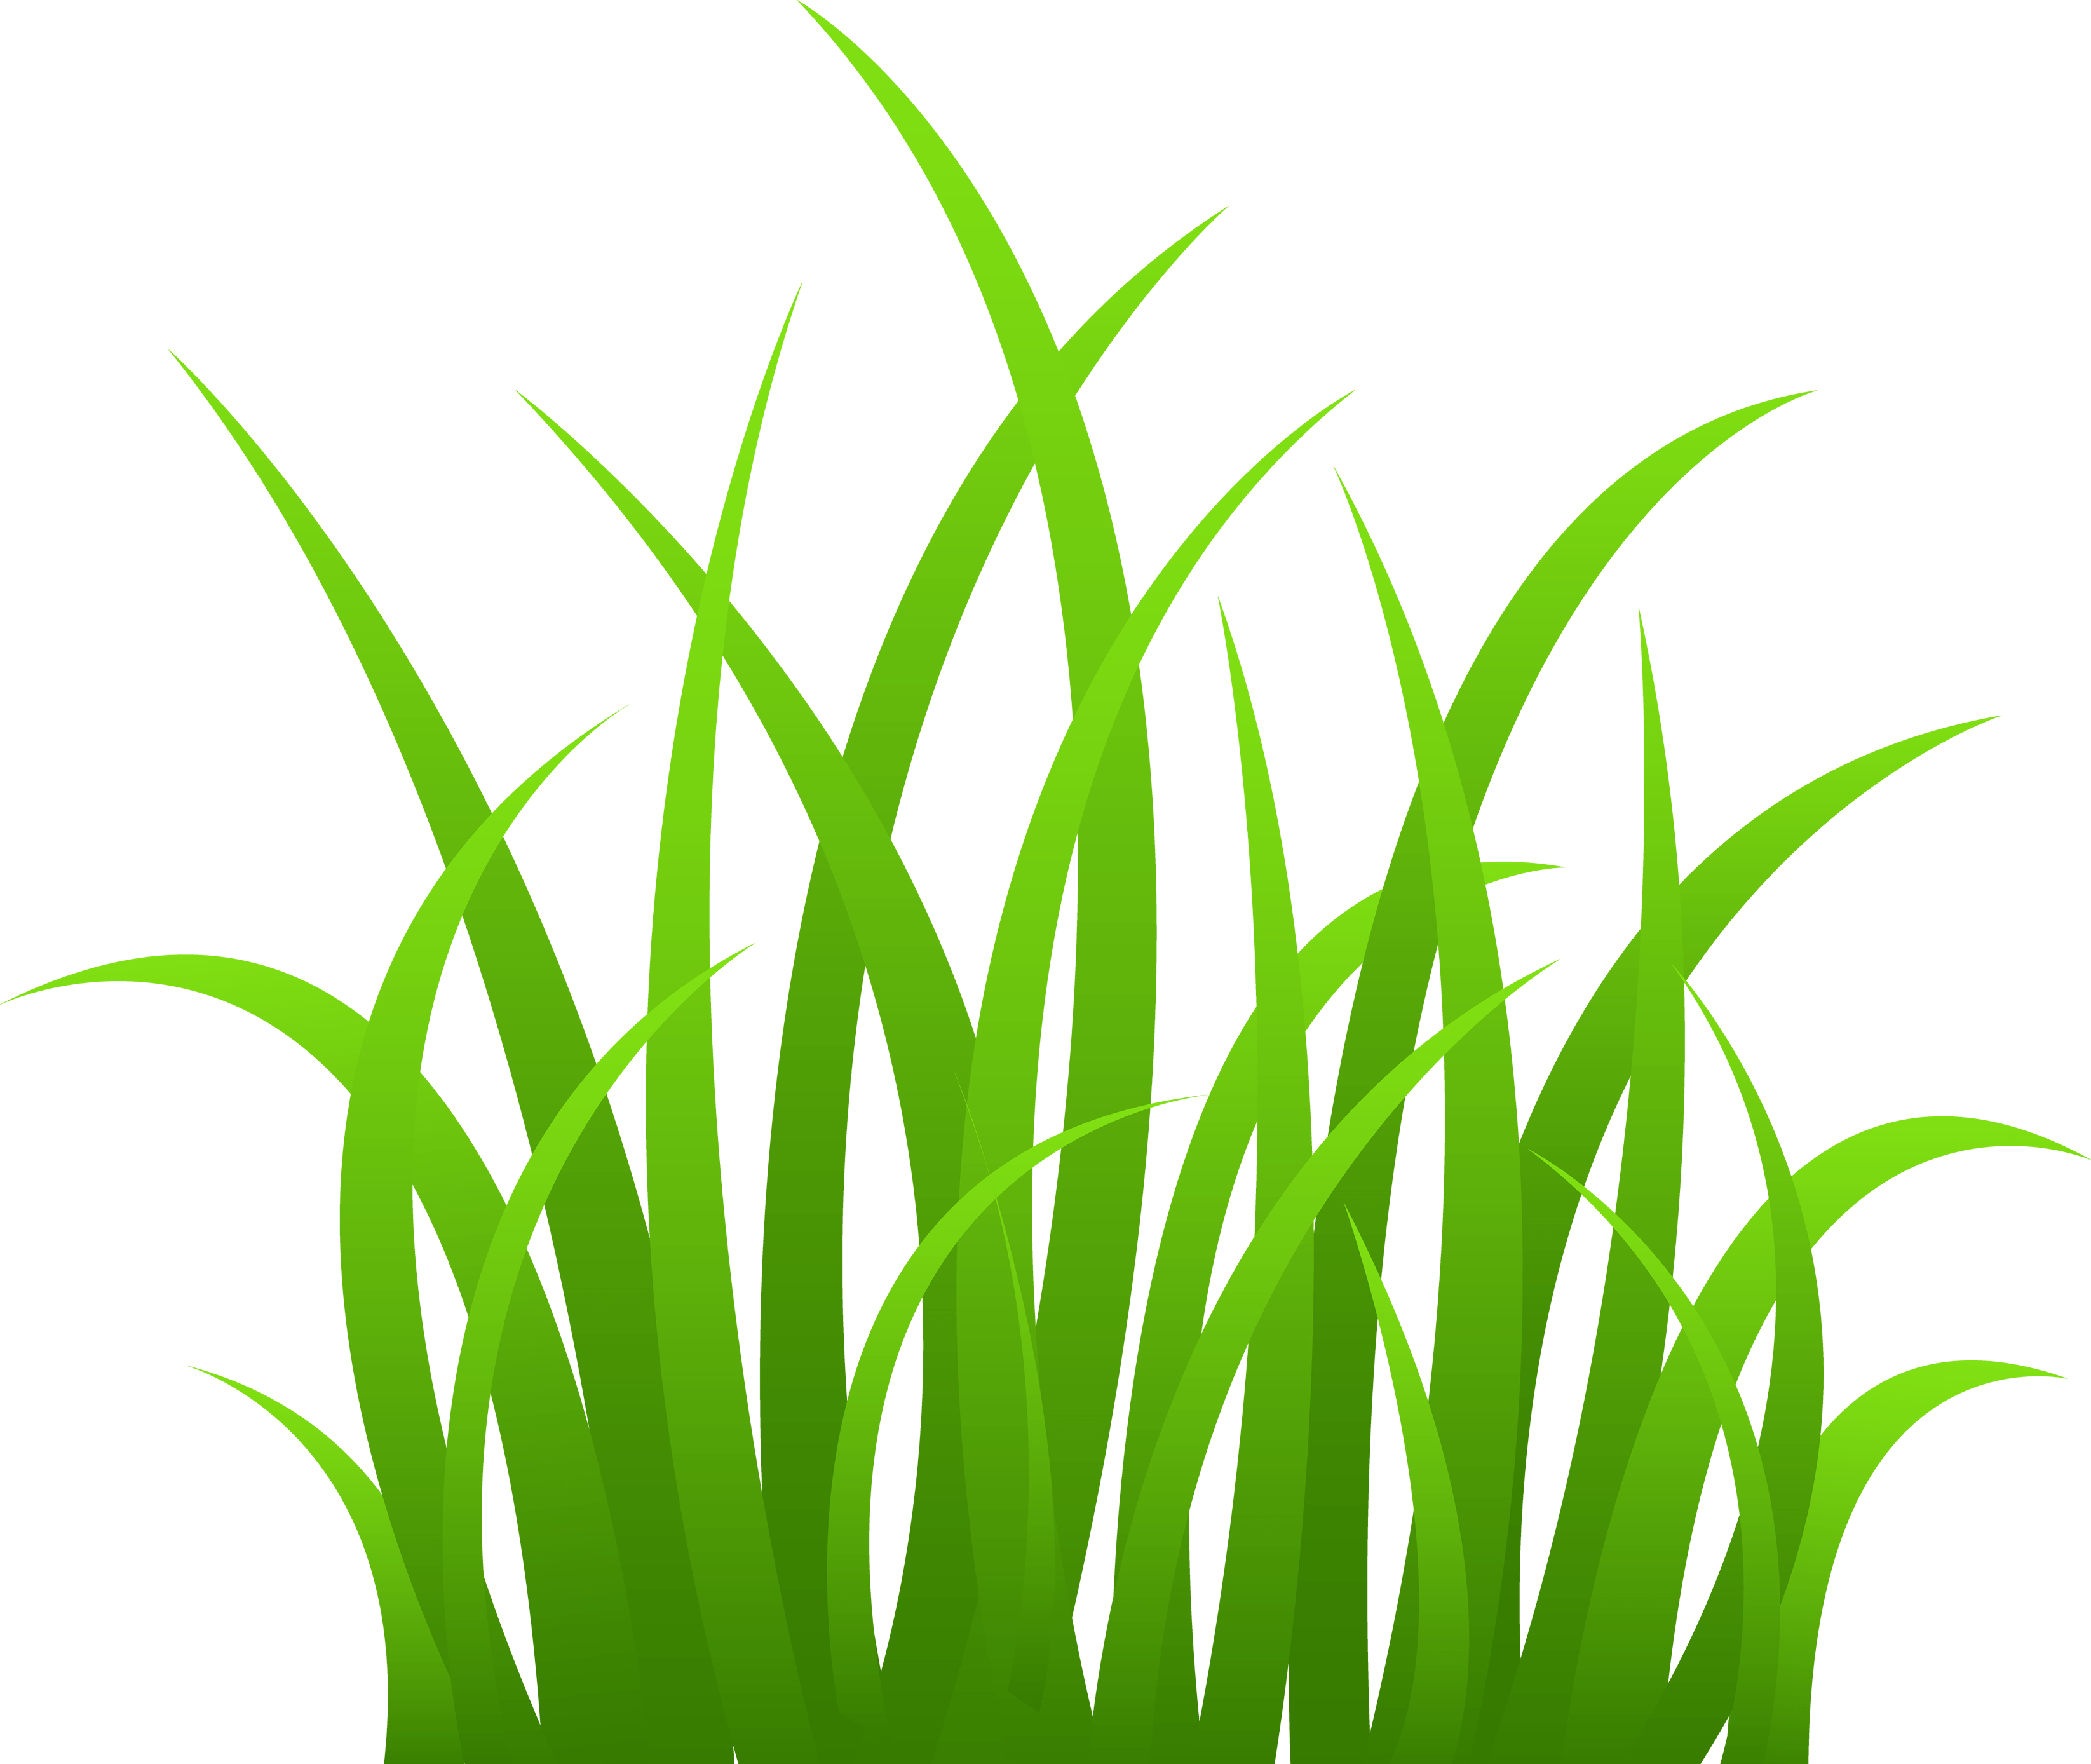 Grass HD PNG - 119876